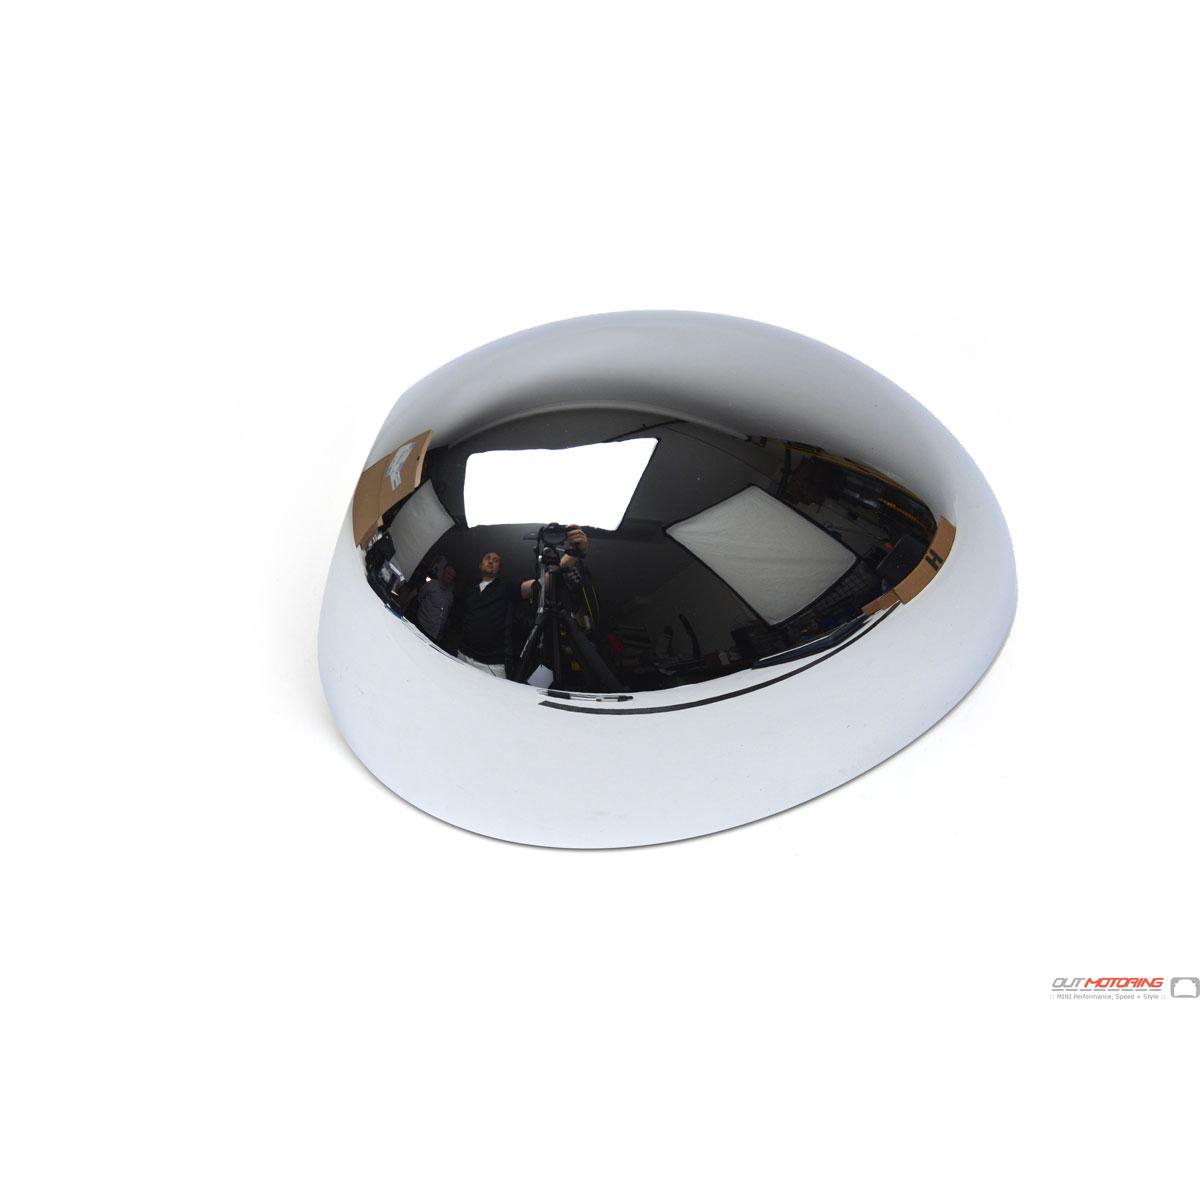 Black Melchioni 335014576/Cap for Car Mirror